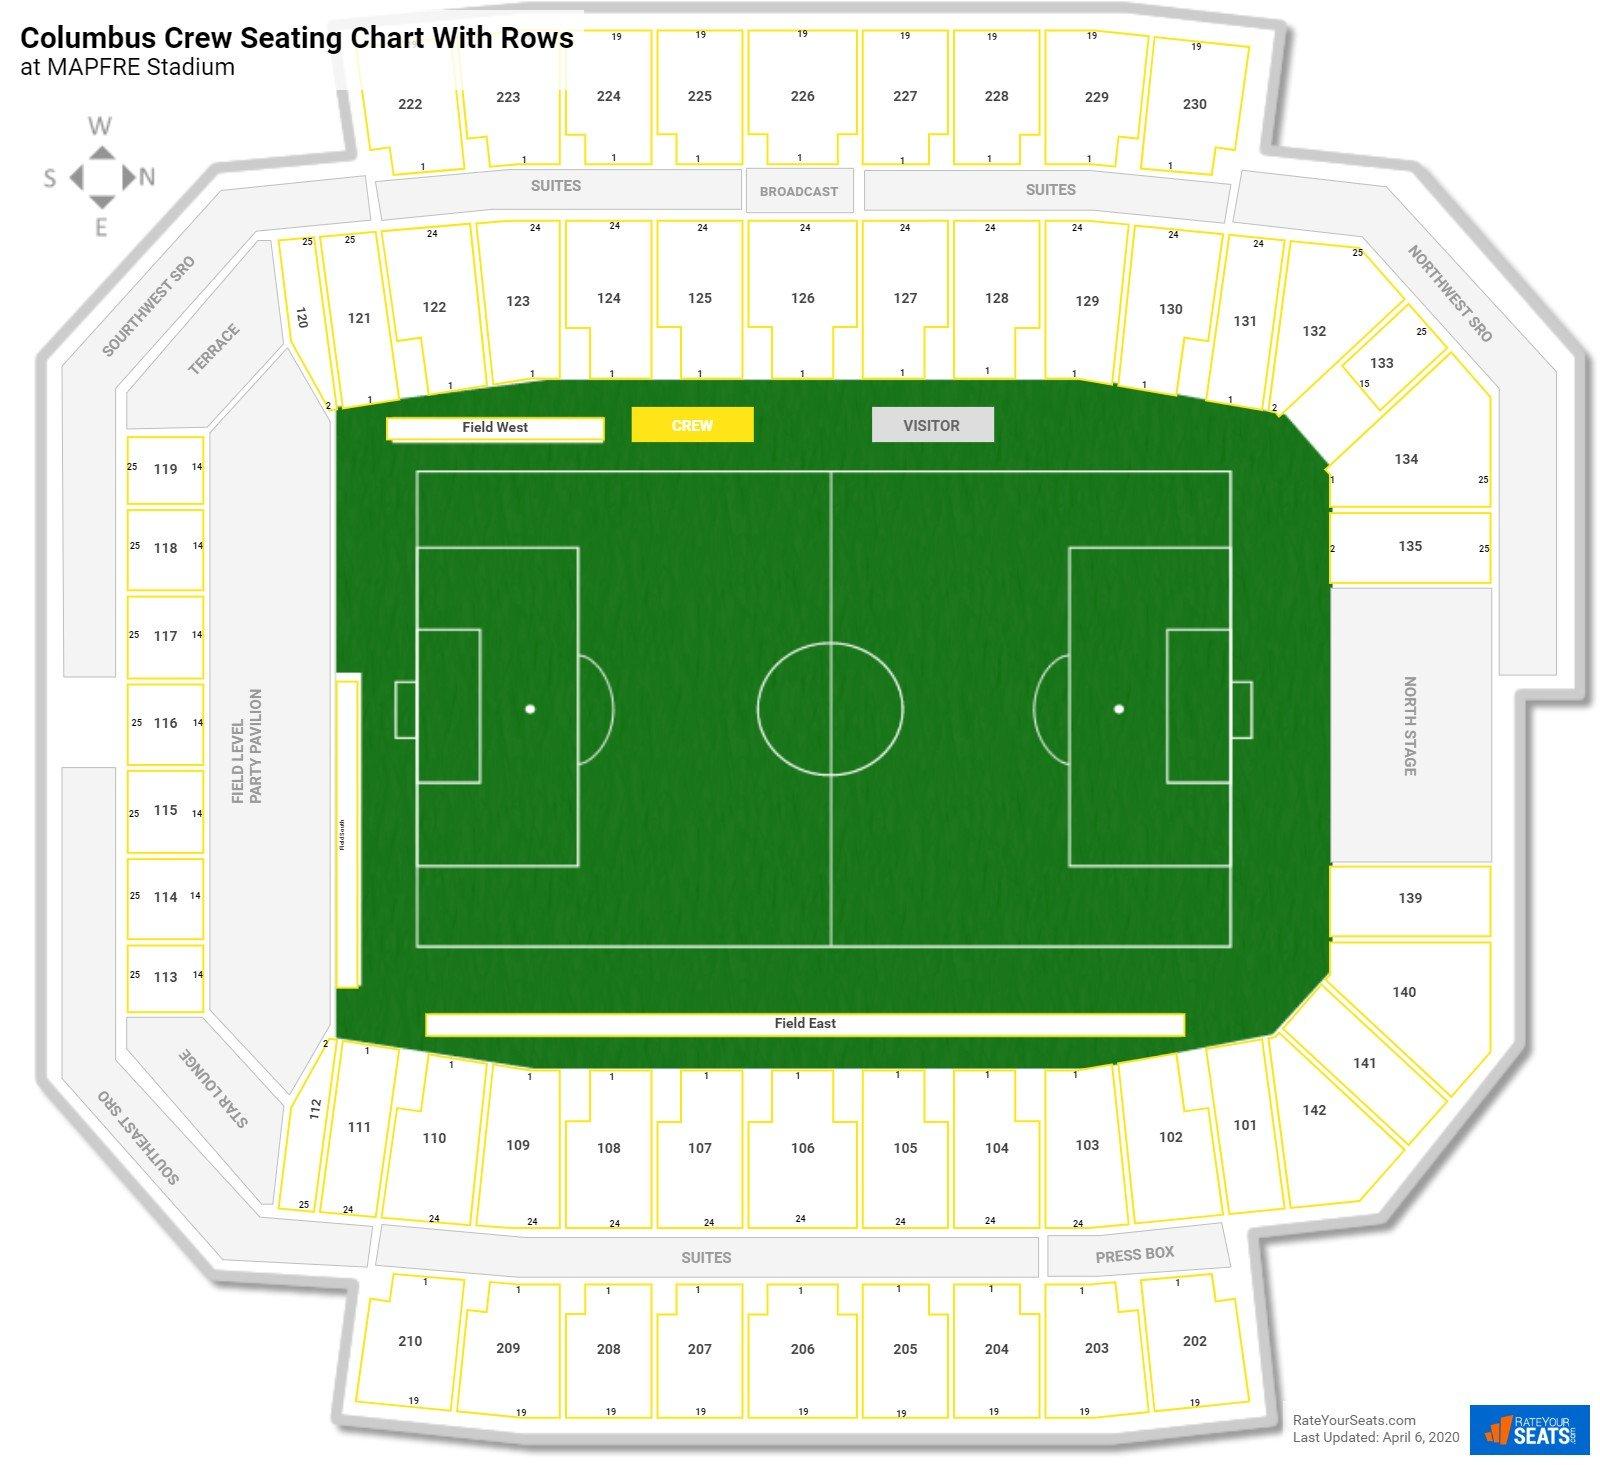 mapfre stadium seating for crew games - rateyourseats